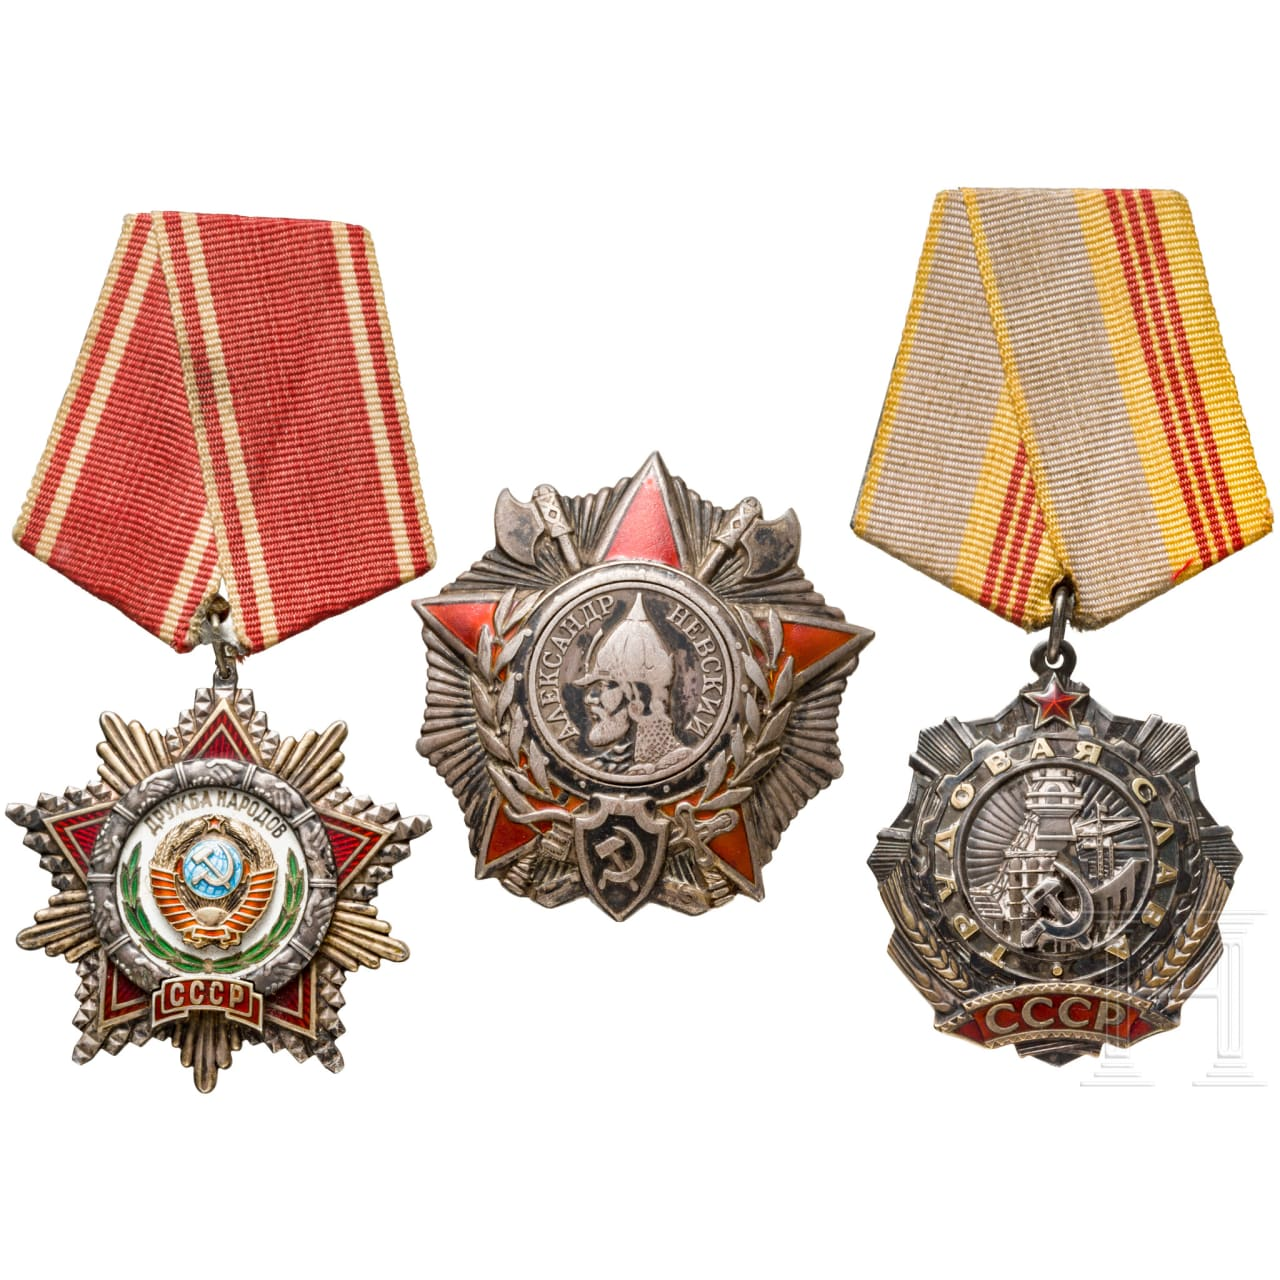 Three Soviet awards, since 1943